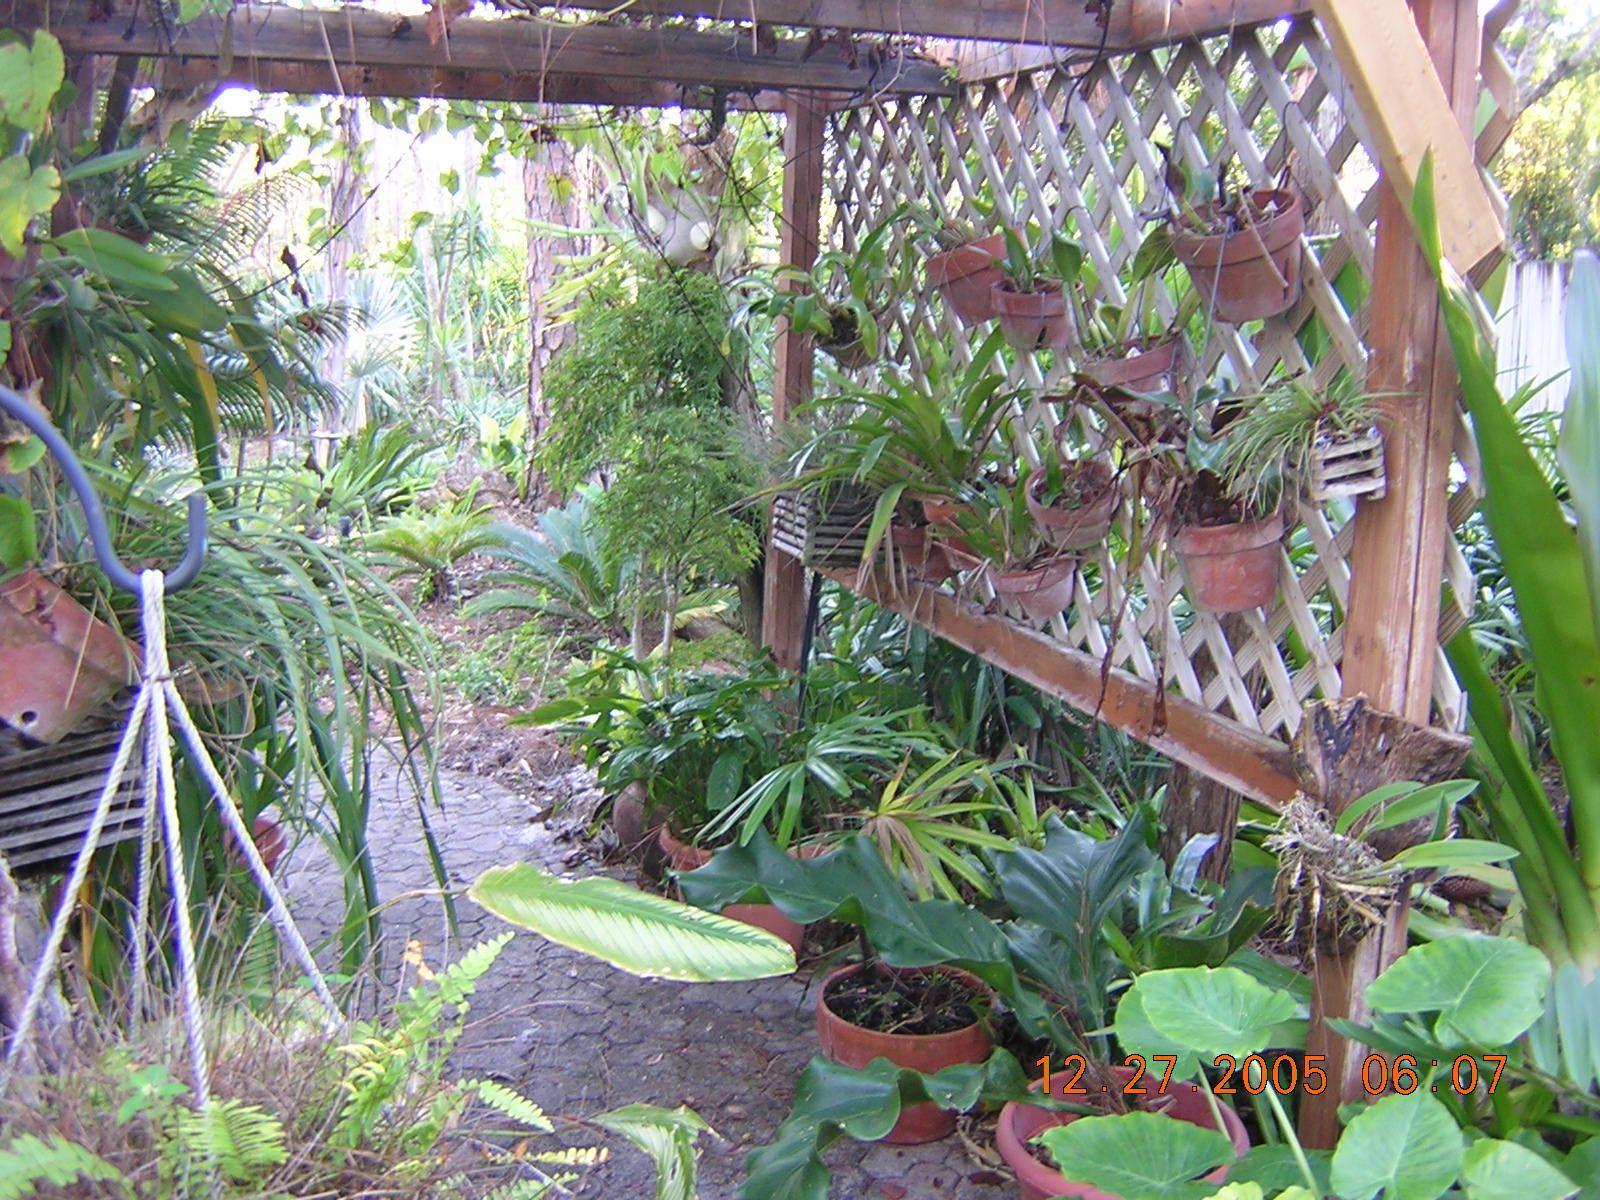 a87b04c2f785aa9ed8eac407a67a8e30 - The Tavern Orchid Gardens Room Rates